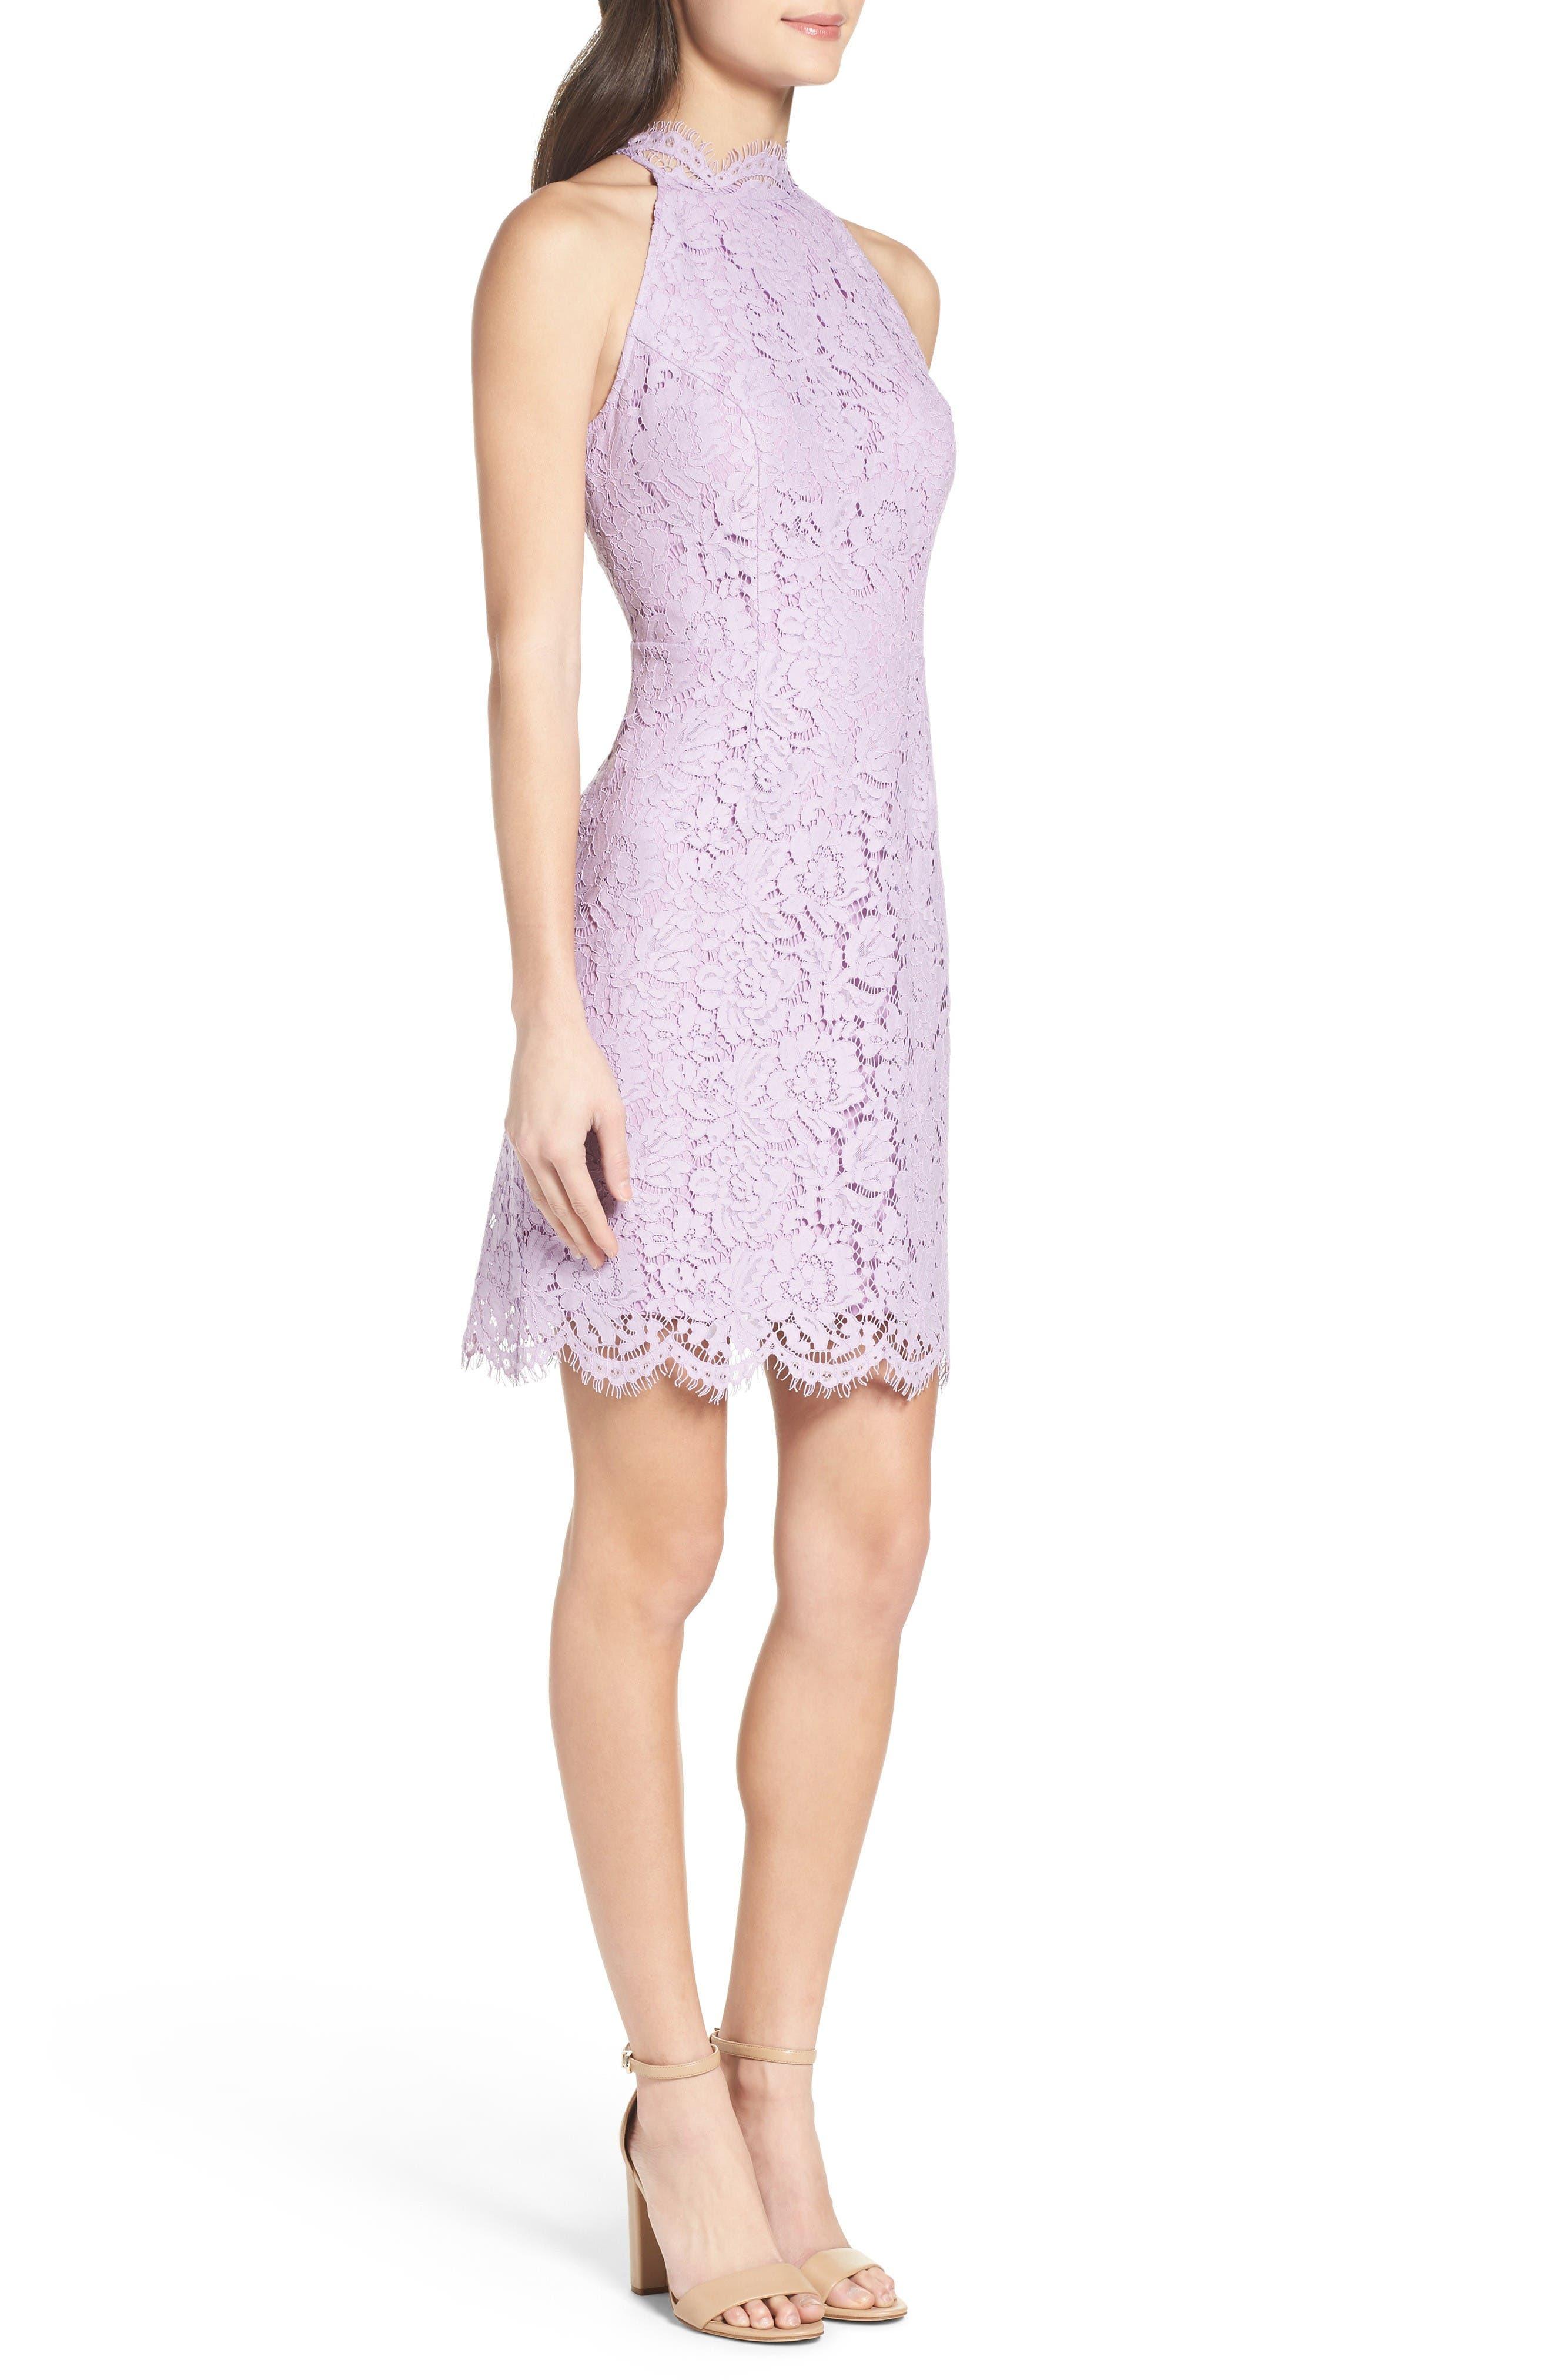 'Cara' High Neck Lace Dress,                             Alternate thumbnail 3, color,                             Lavender